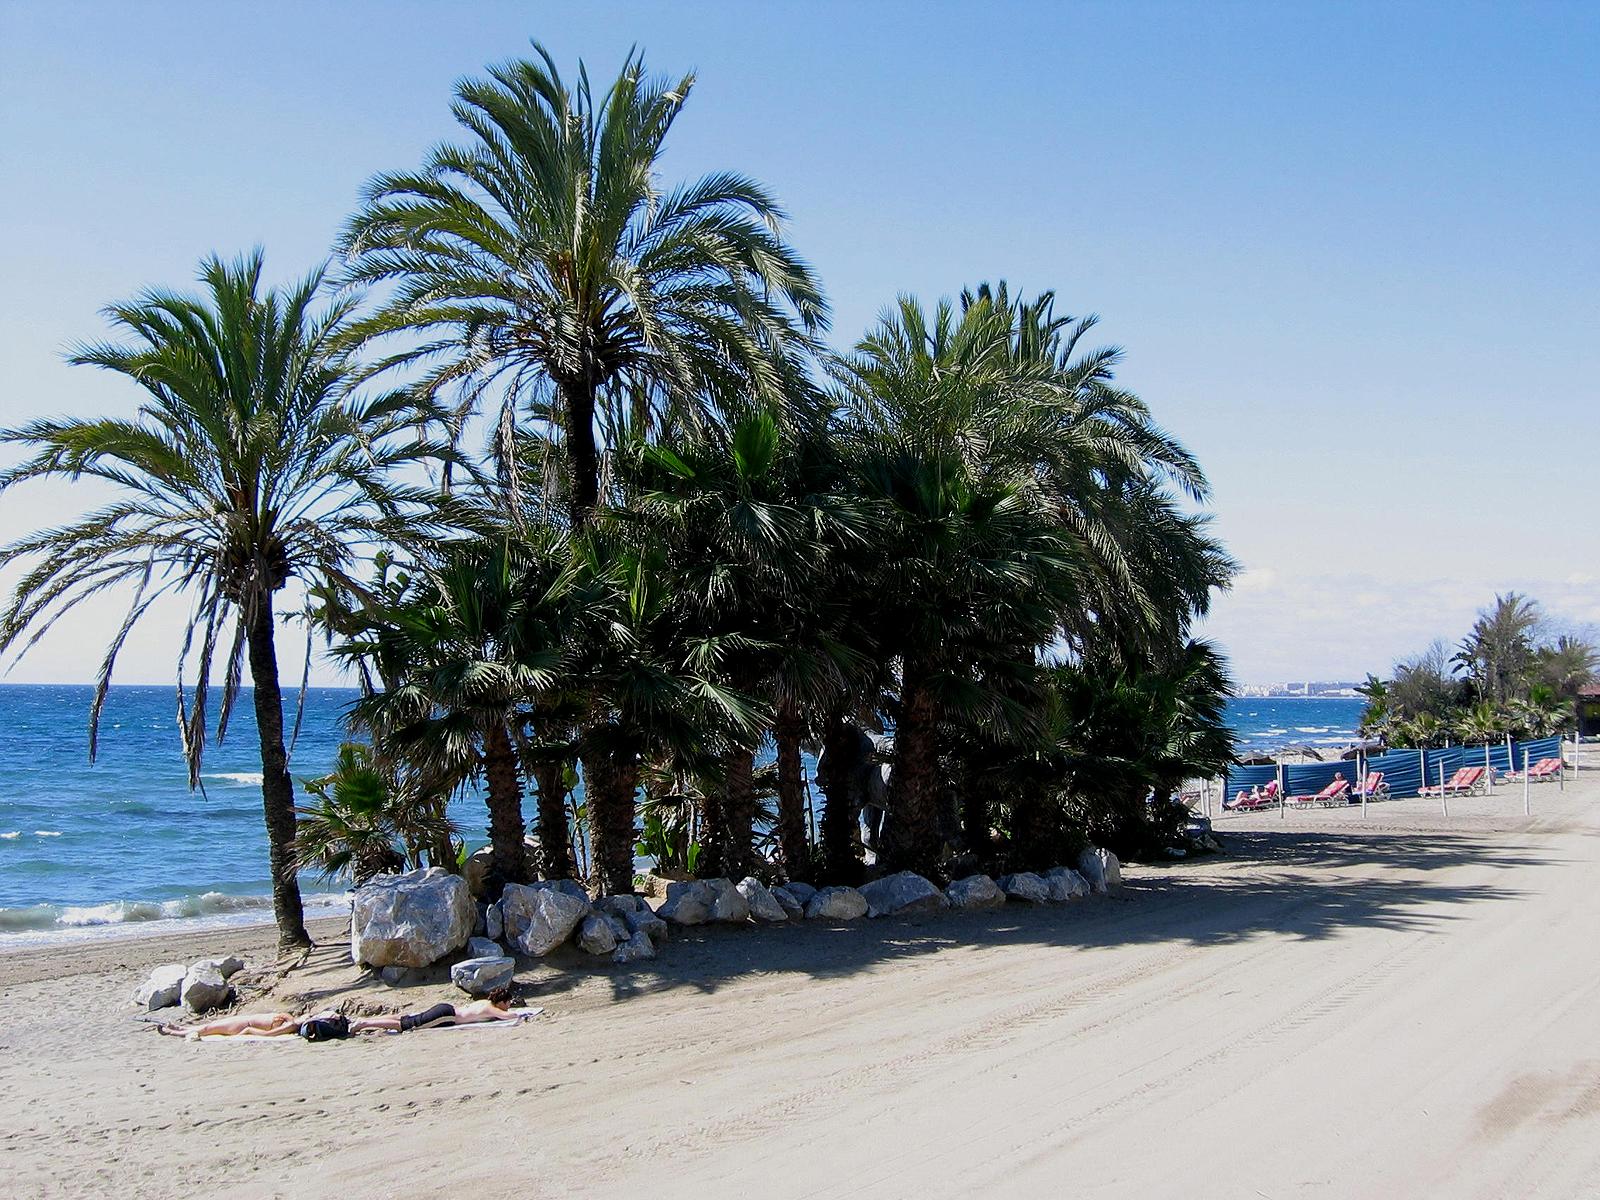 Playa La Venus